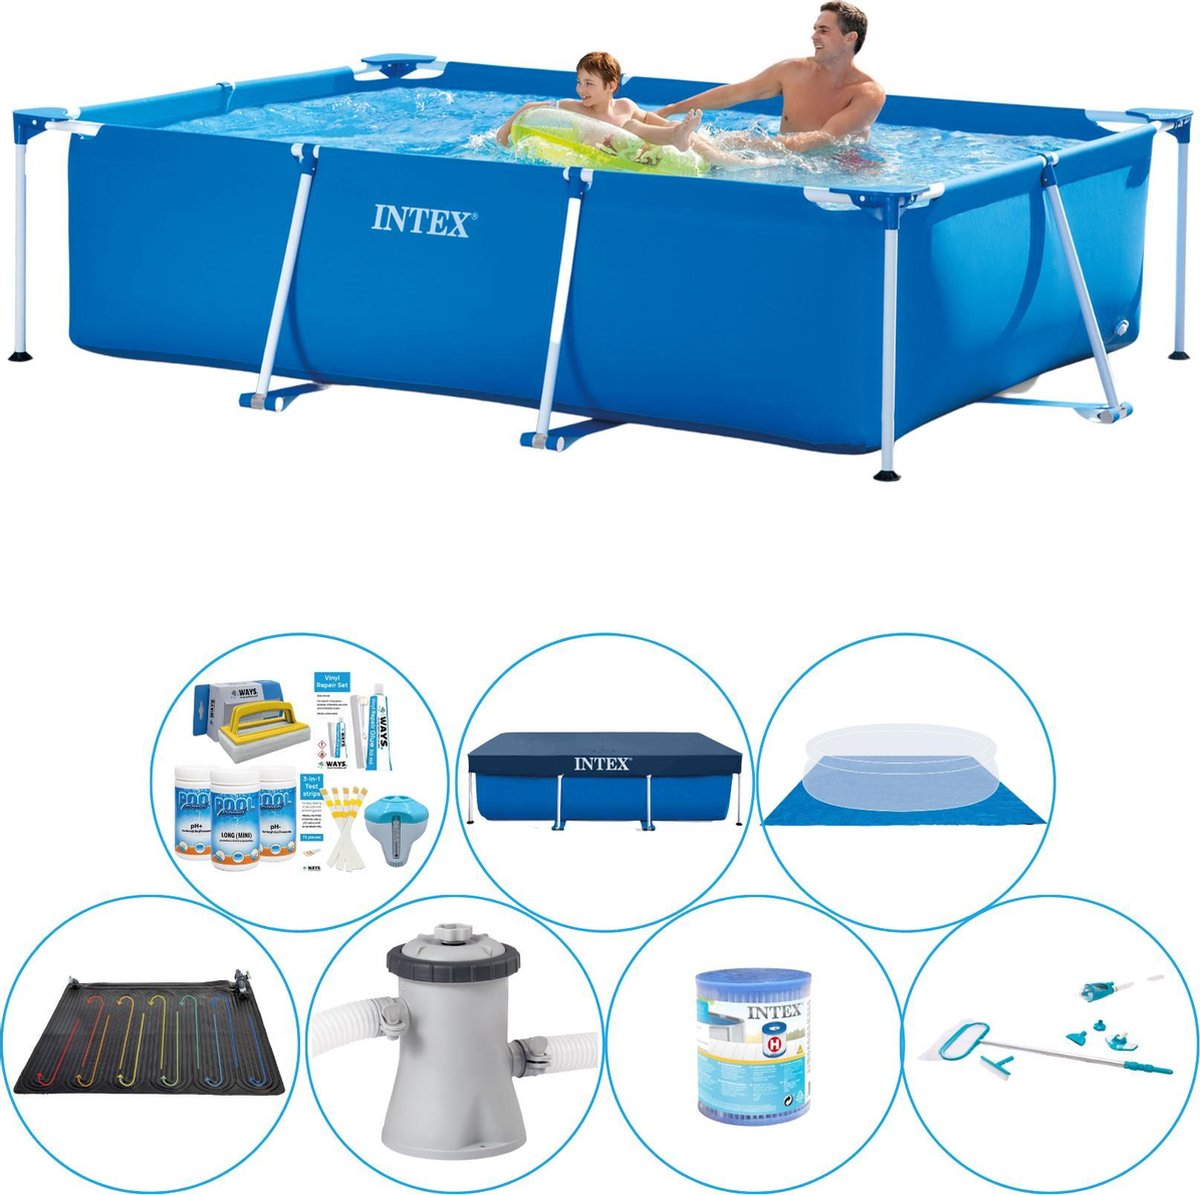 Intex Frame Pool Rechthoekig 260x160x65 cm - Zwembad Set